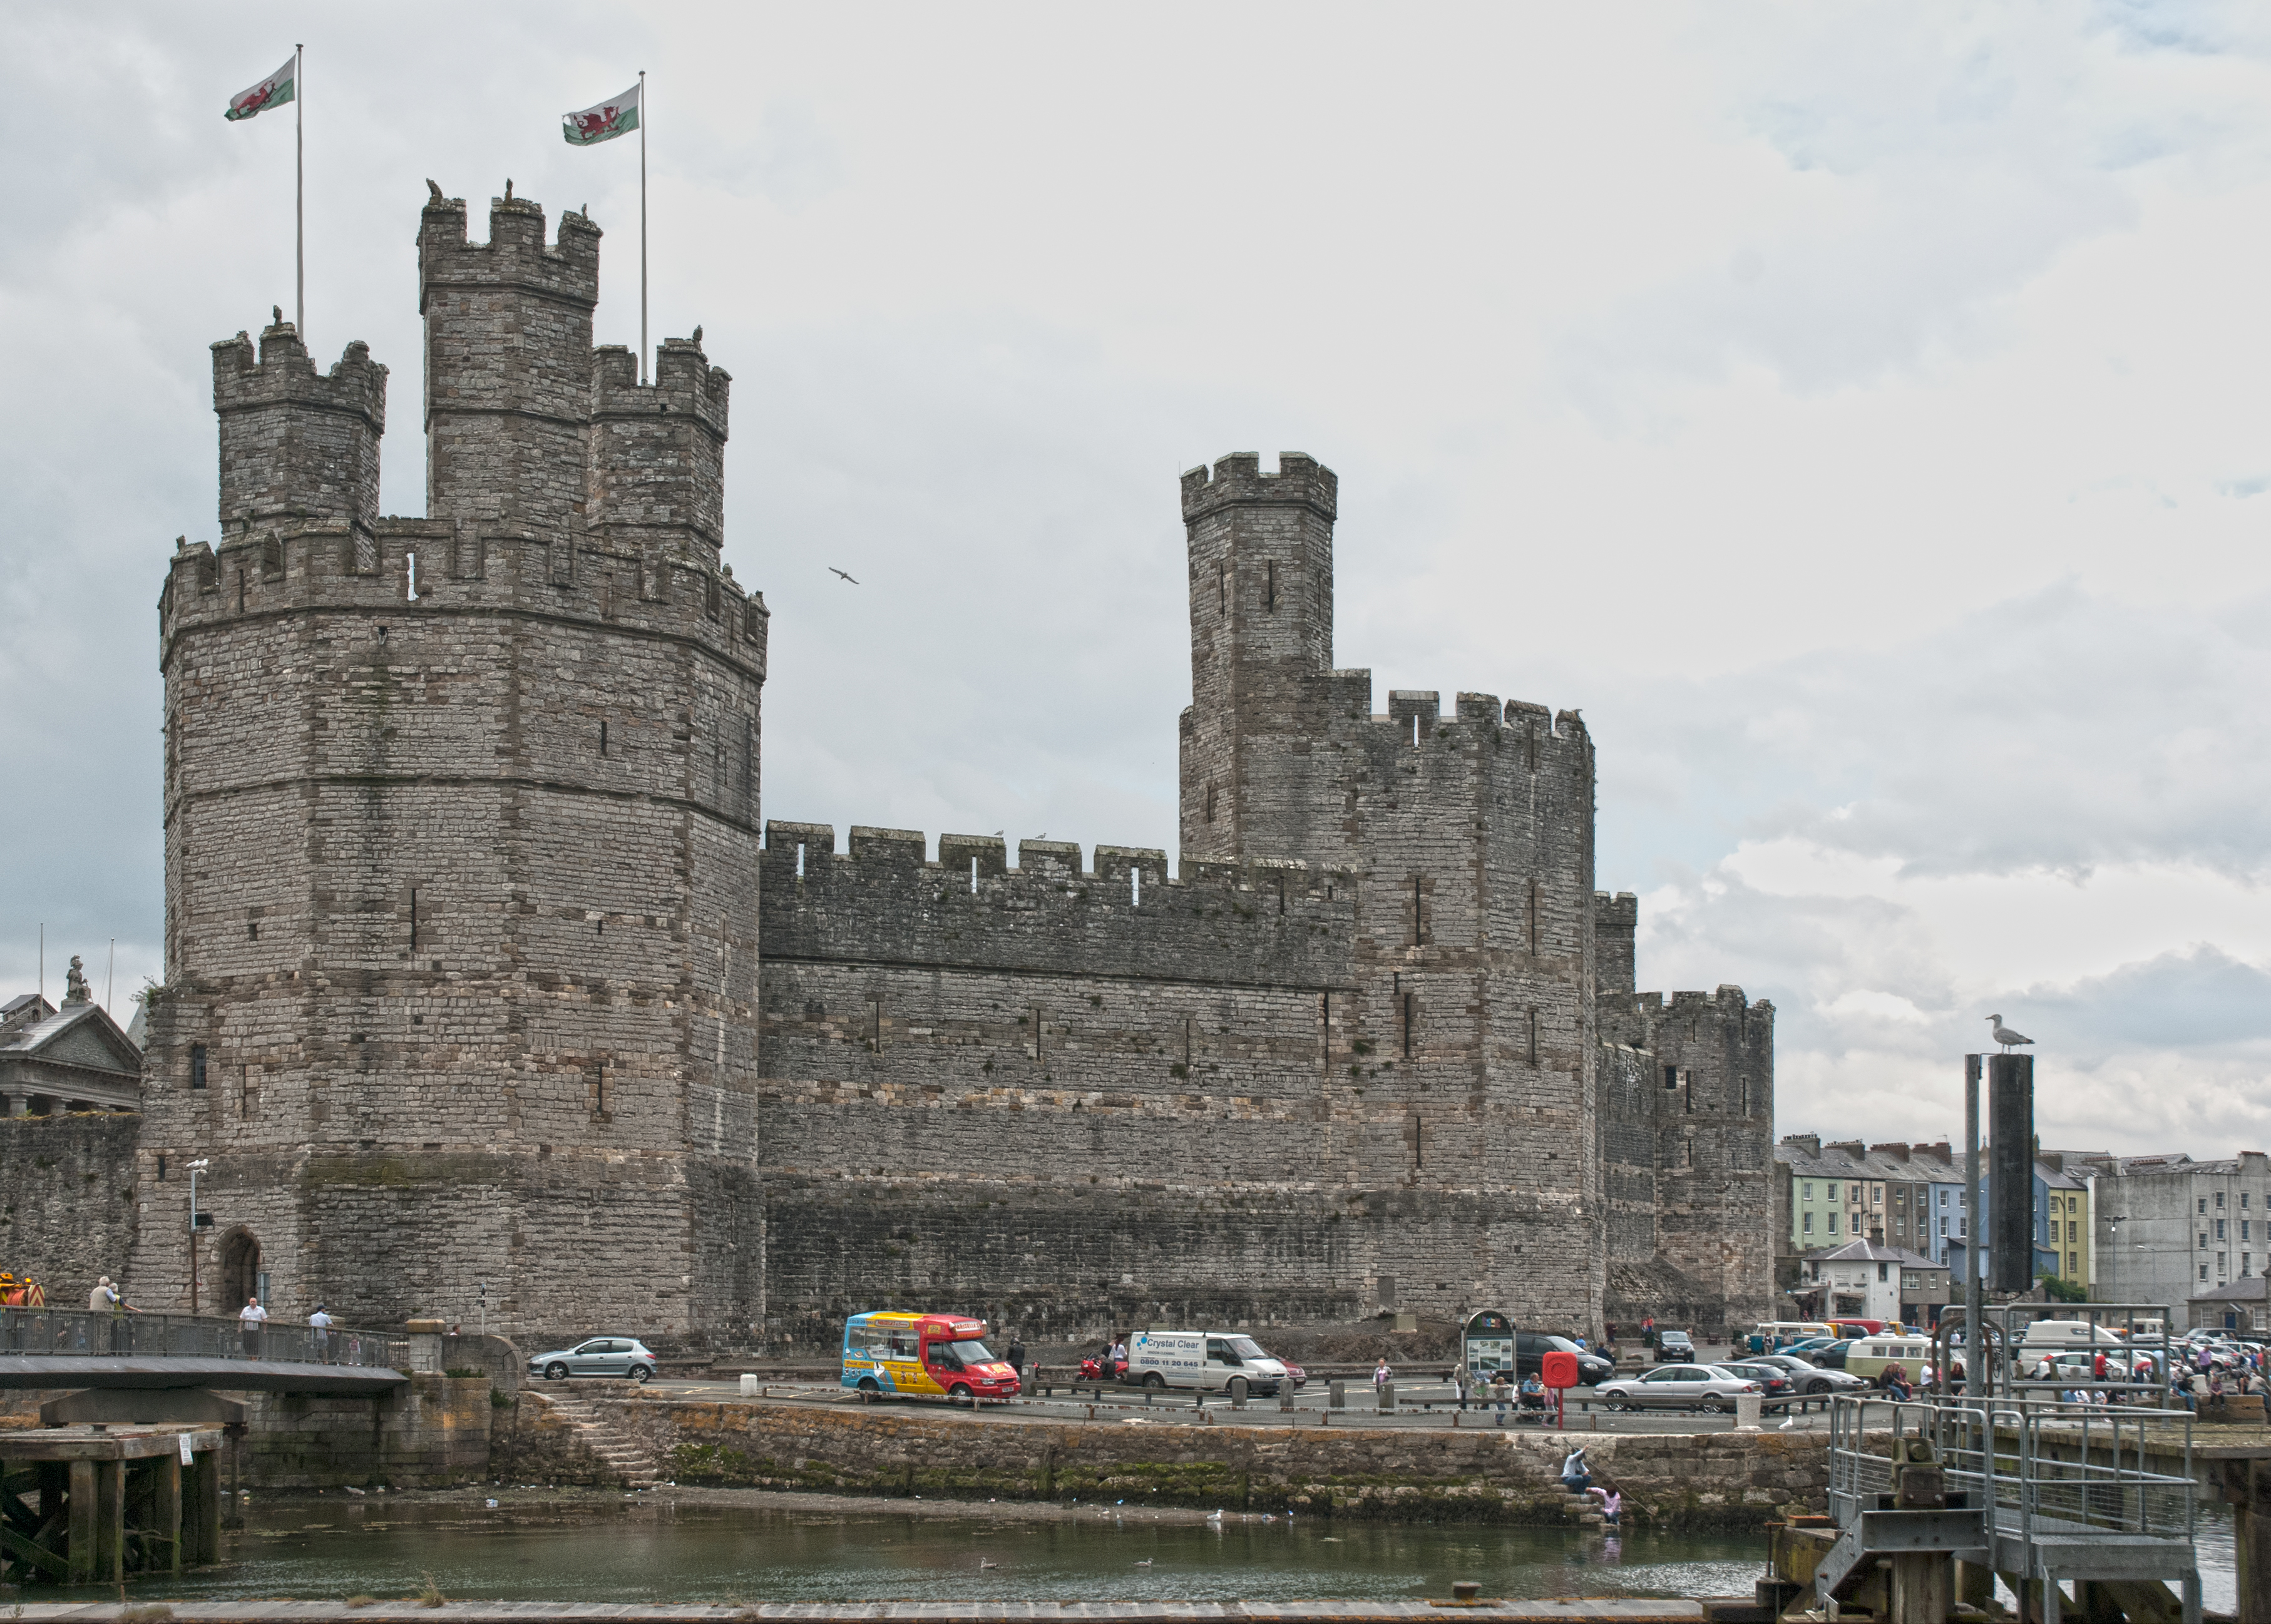 Turistica Viaggio WikivoyageGuida Galles WikivoyageGuida Di Galles wP8kO0n